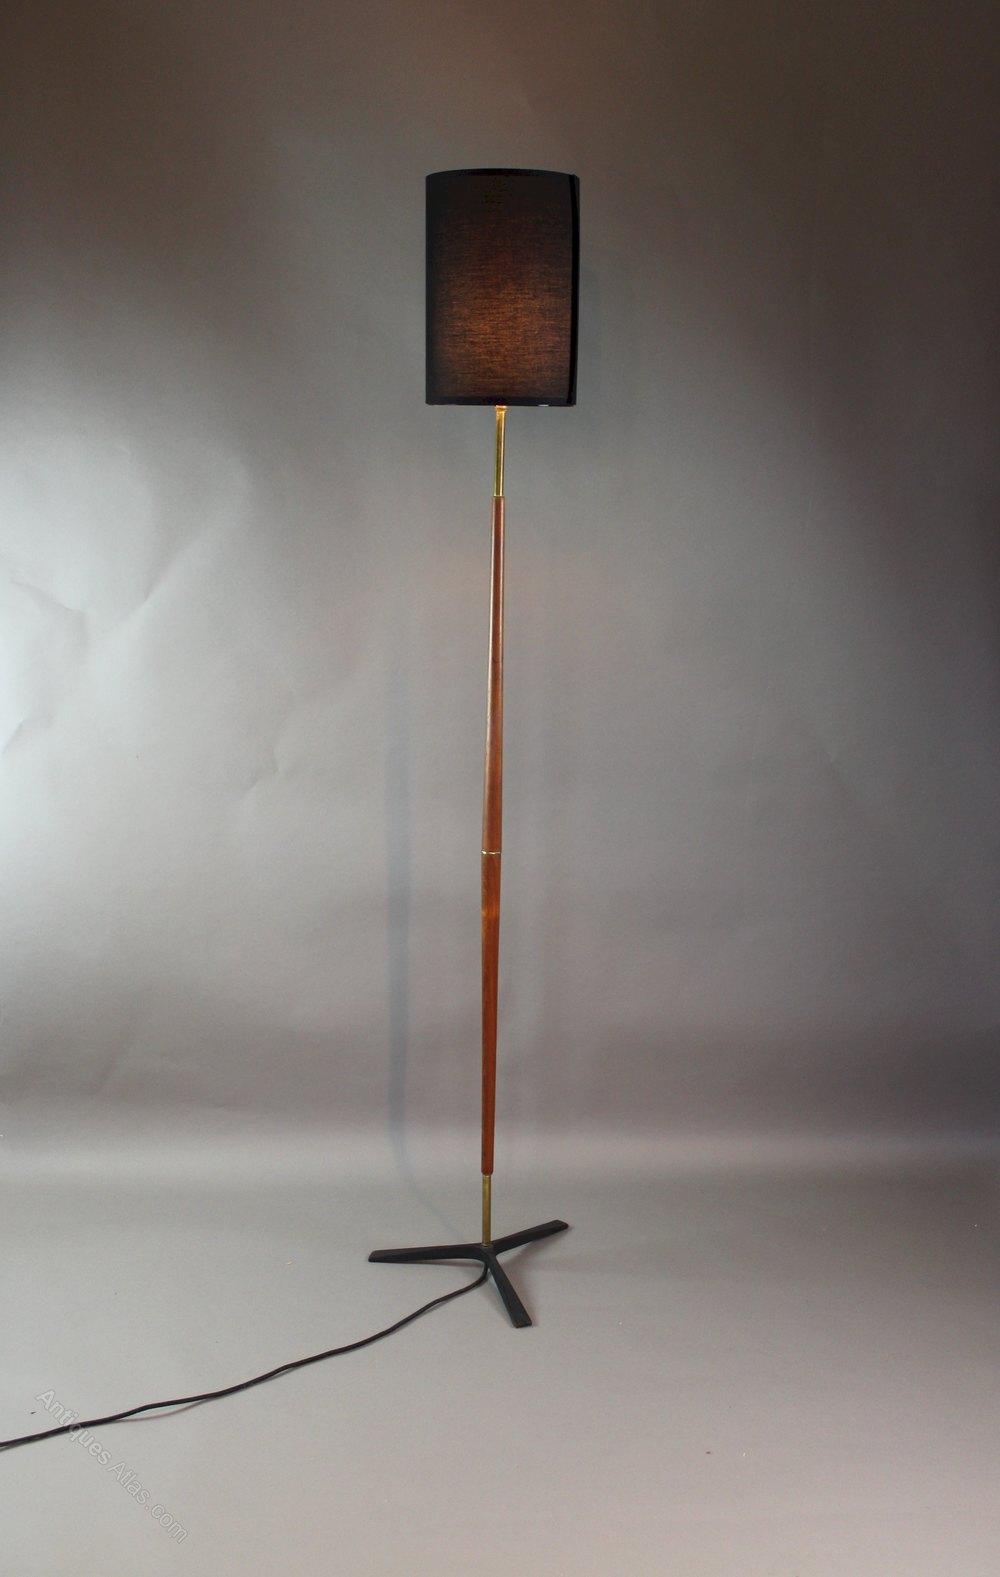 ^ ntiques tlas - 1950's Mid-century Modern eak & Brass Floor Lamp